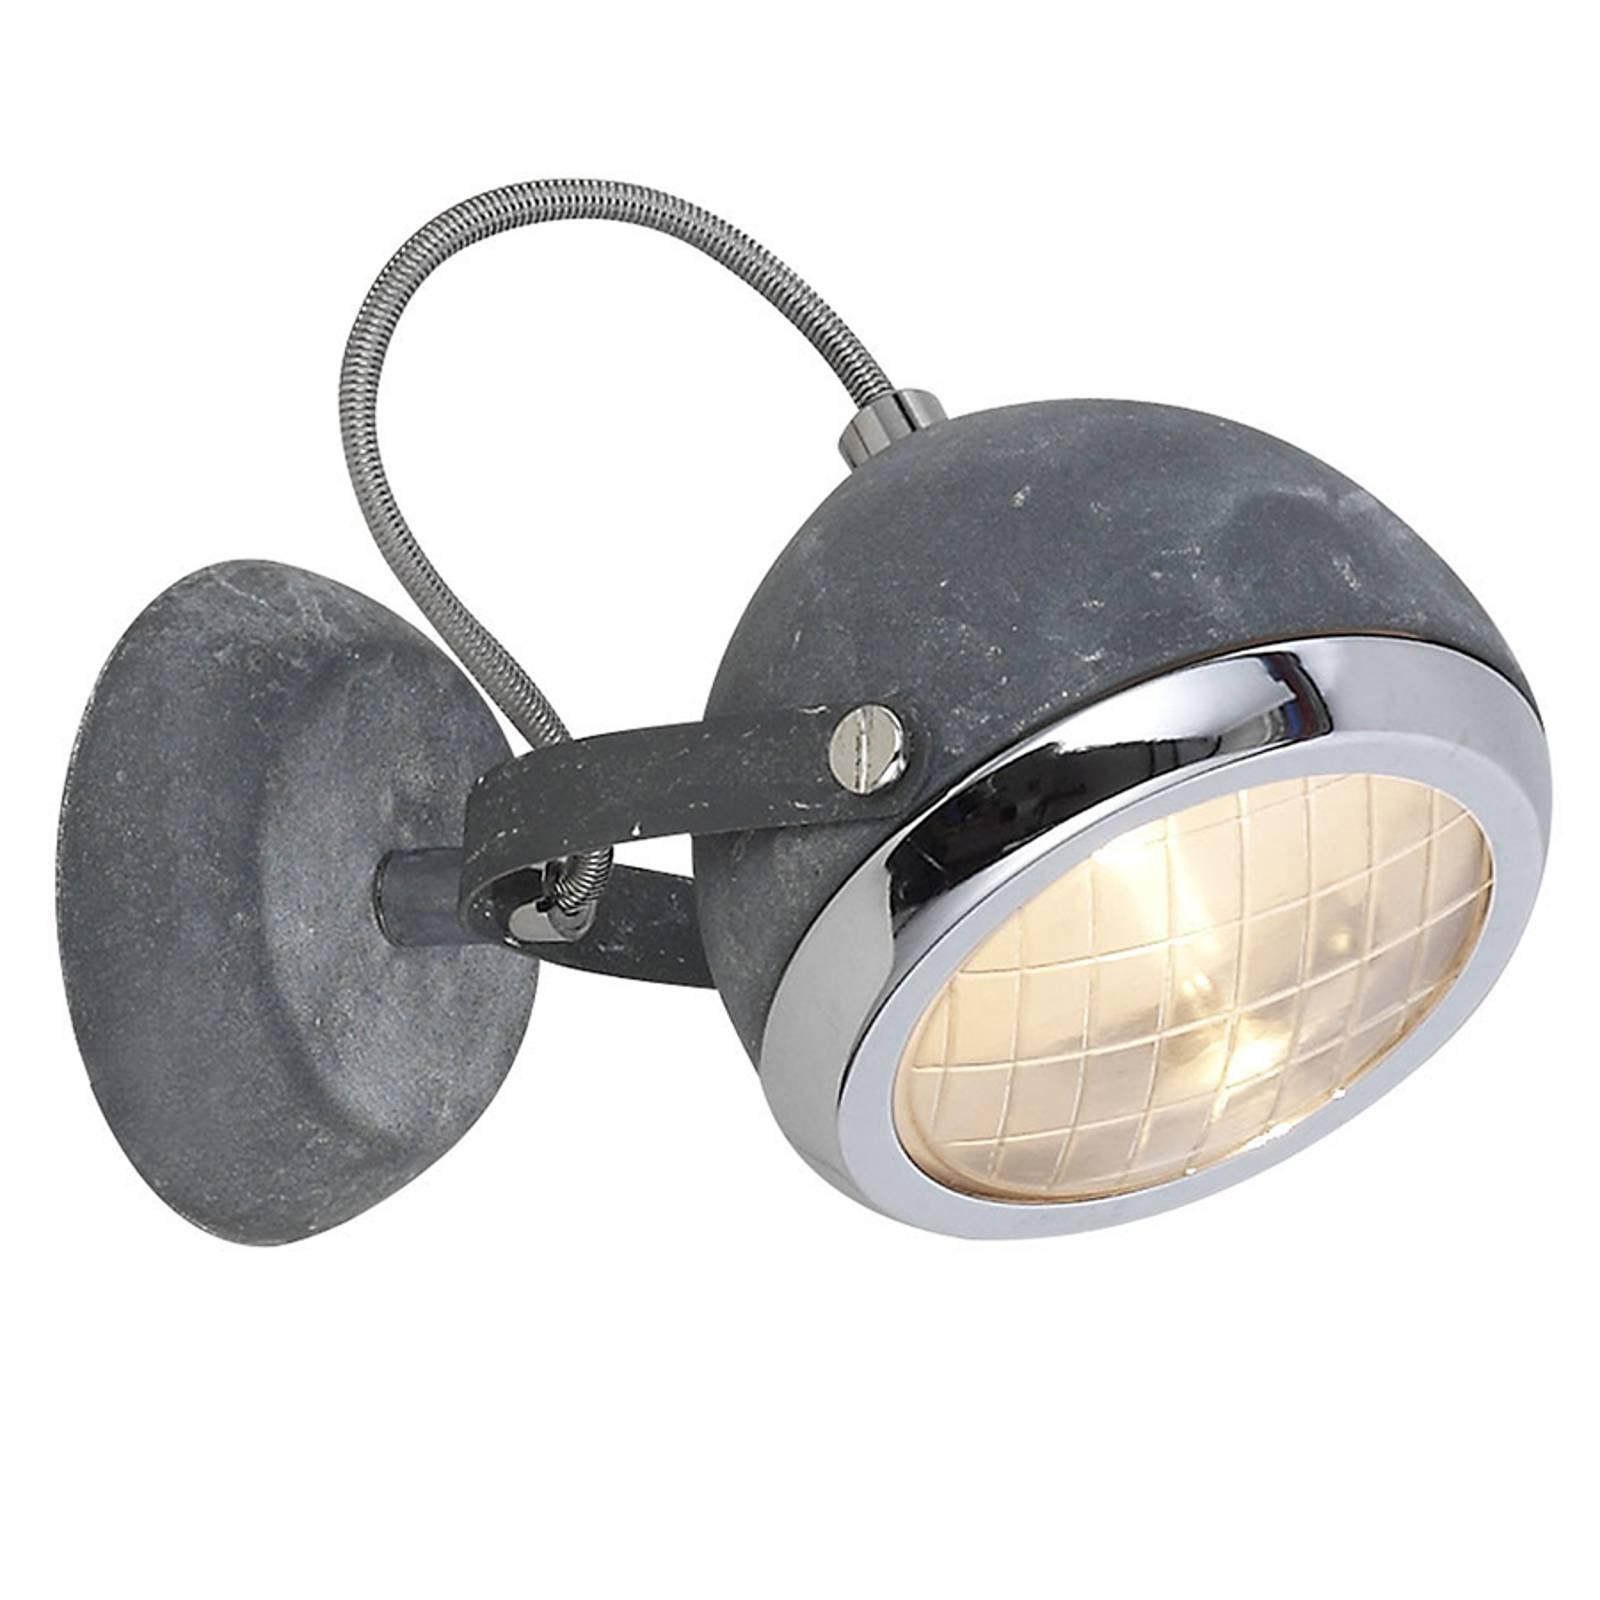 Stijlvolle wandlamp Rider